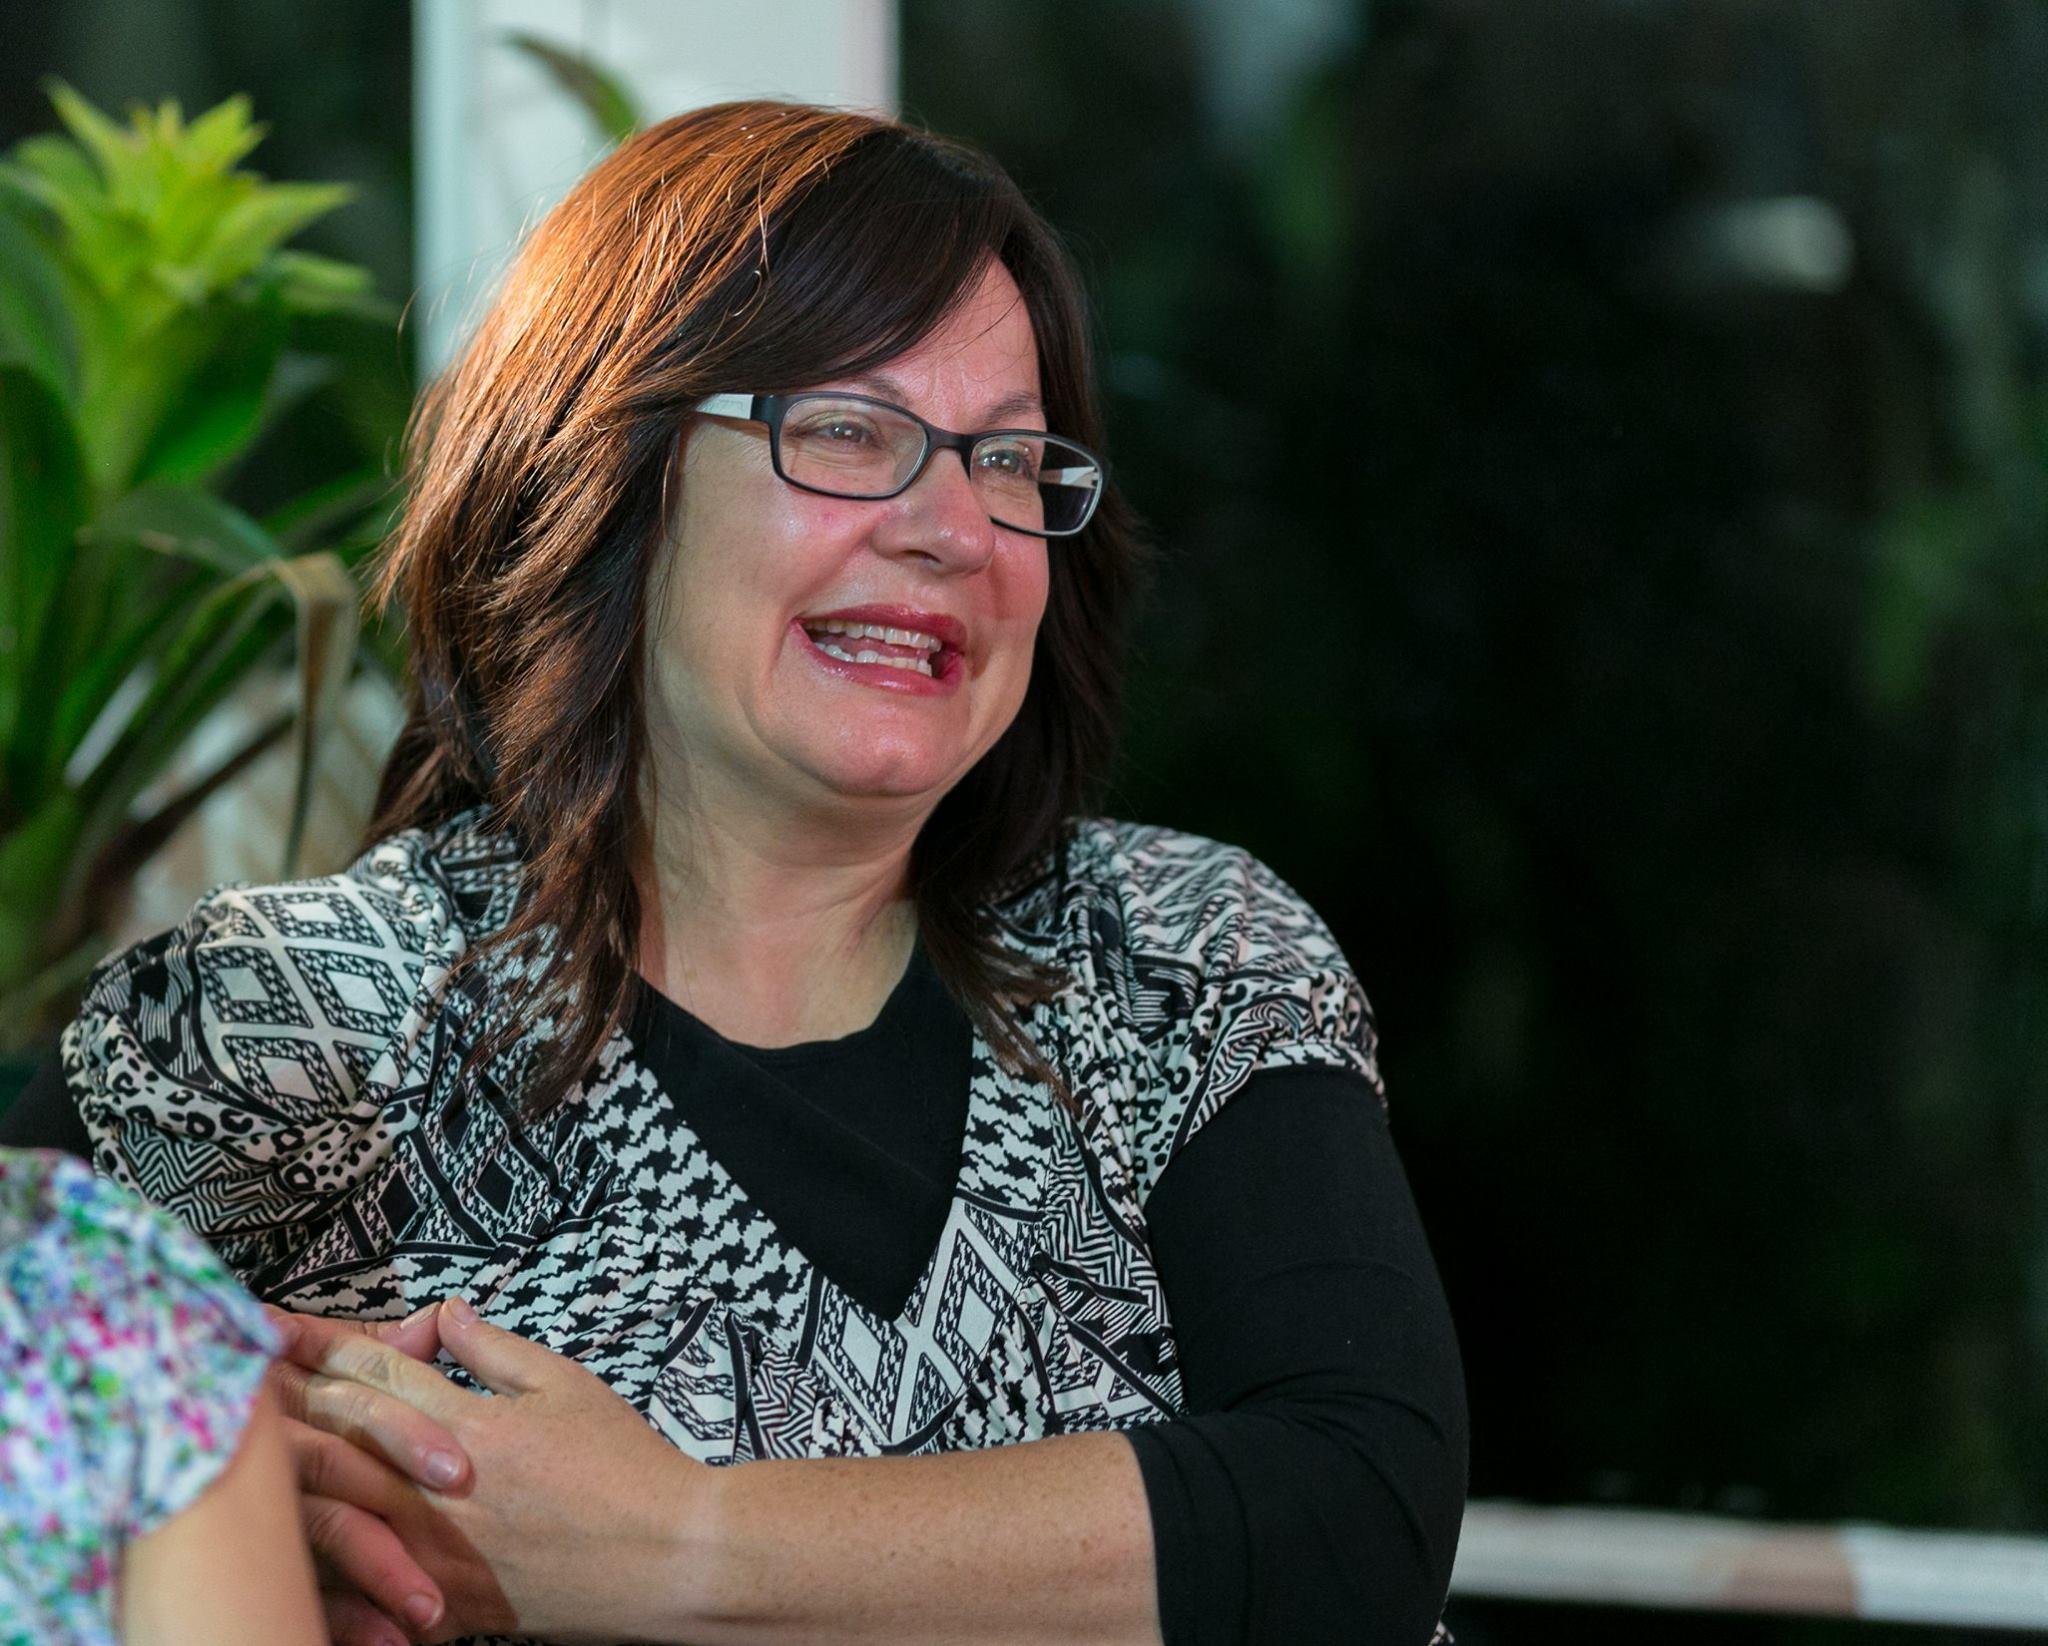 Creative entrepreneur Laya Slavin loving the inspiration